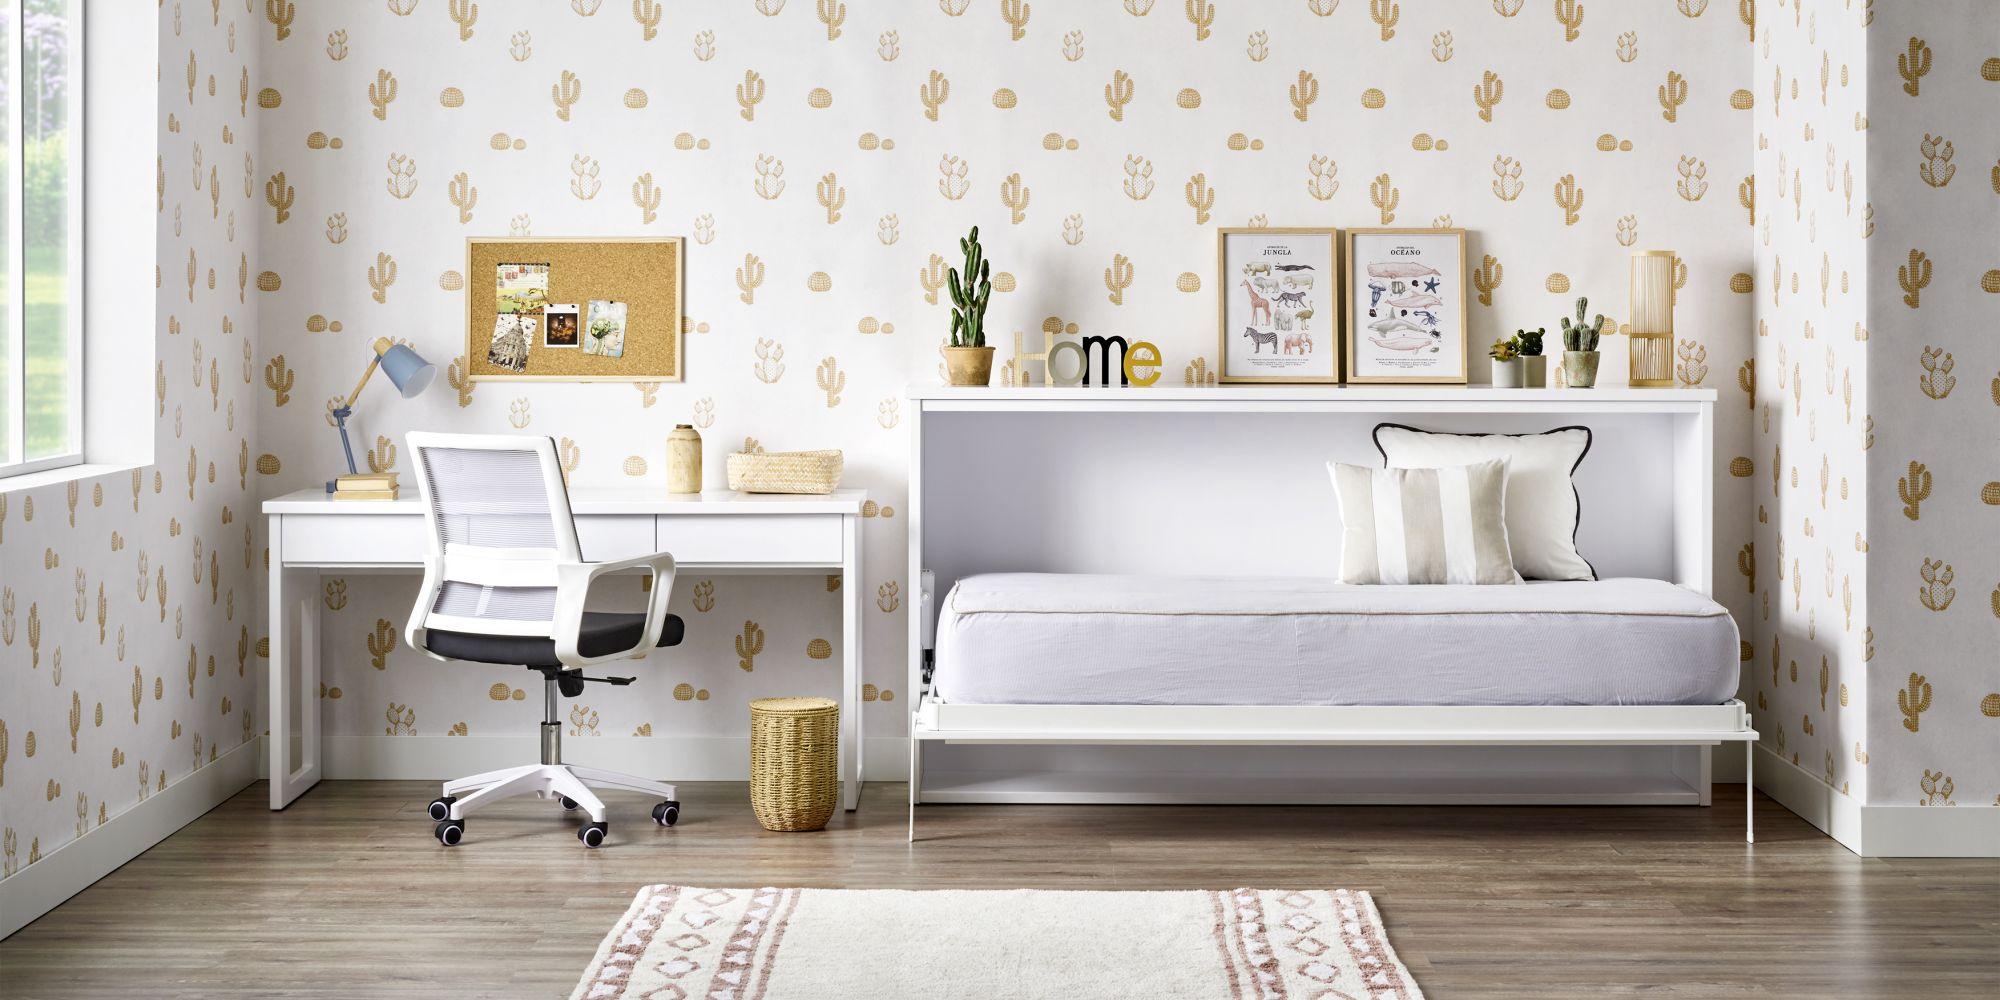 Cama horizontal habitacion pequeña